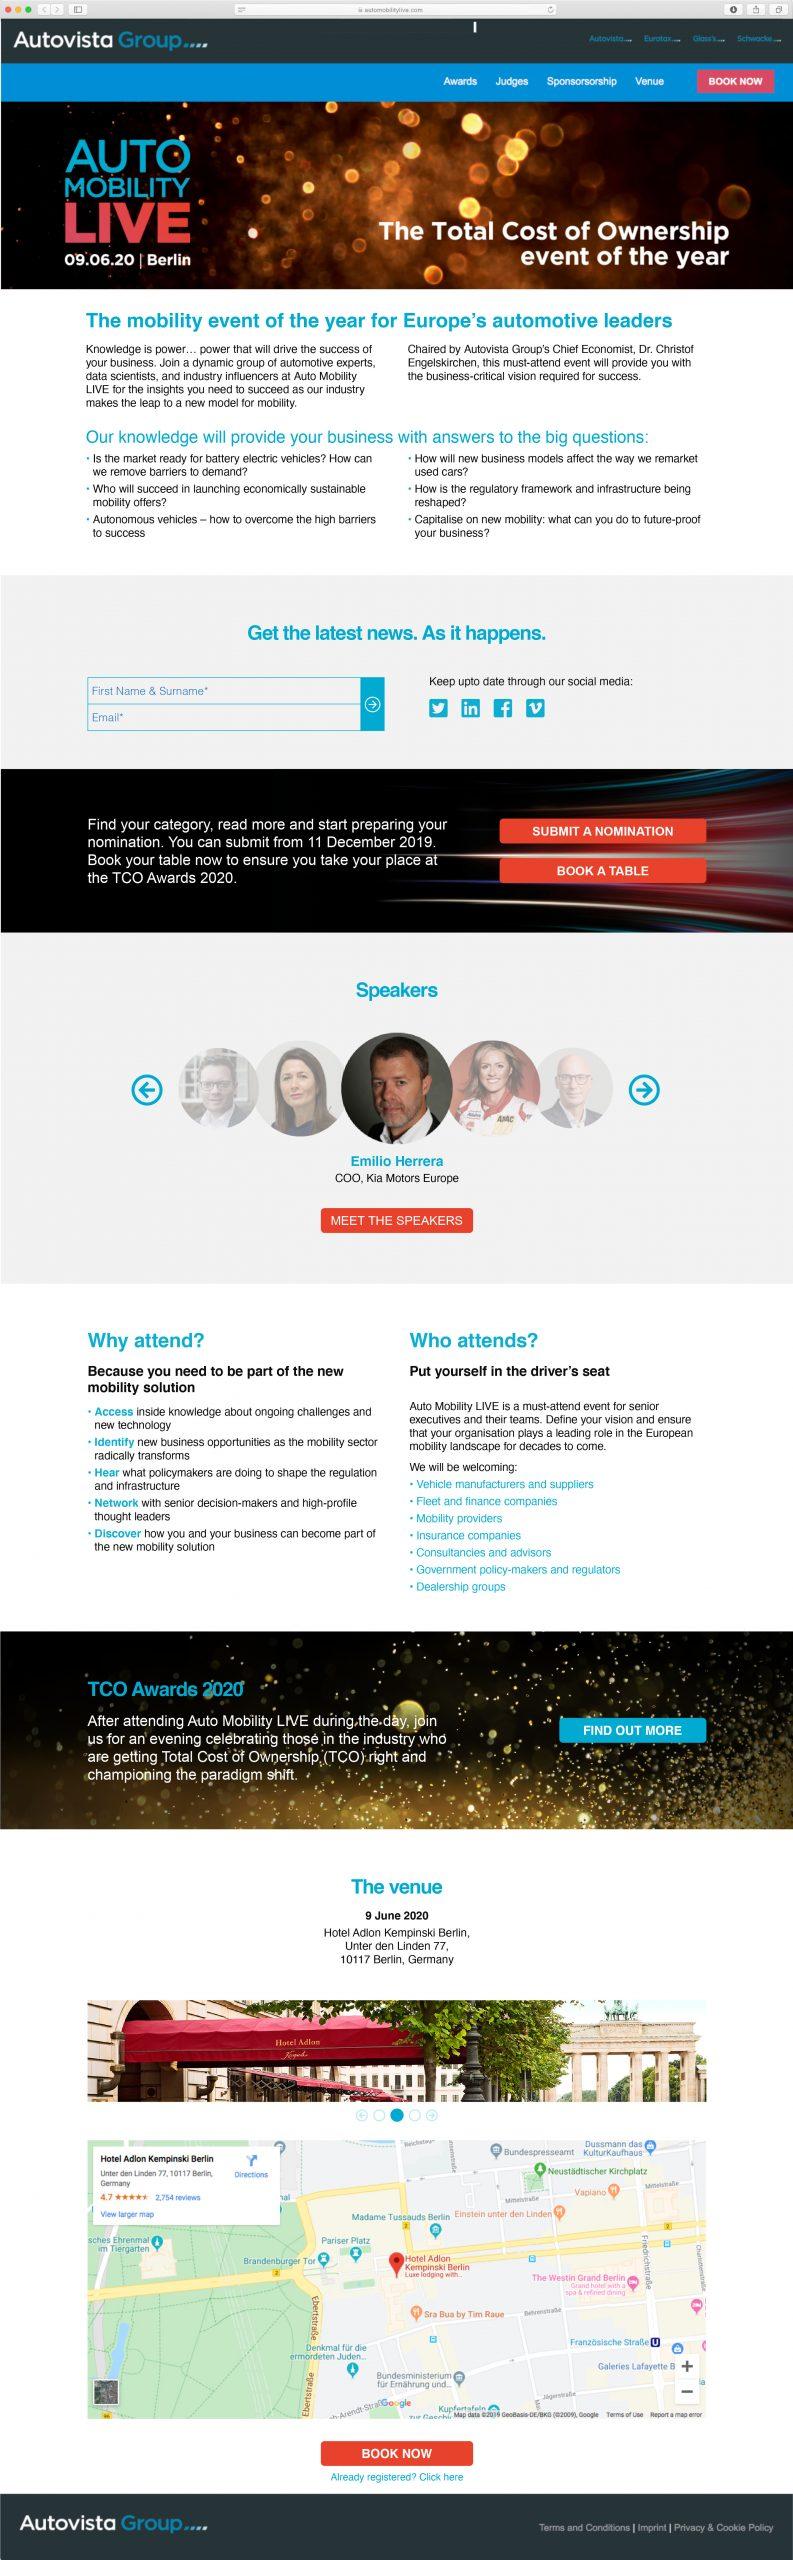 Autovista-Group–Auto-Mobilty-Live–Website